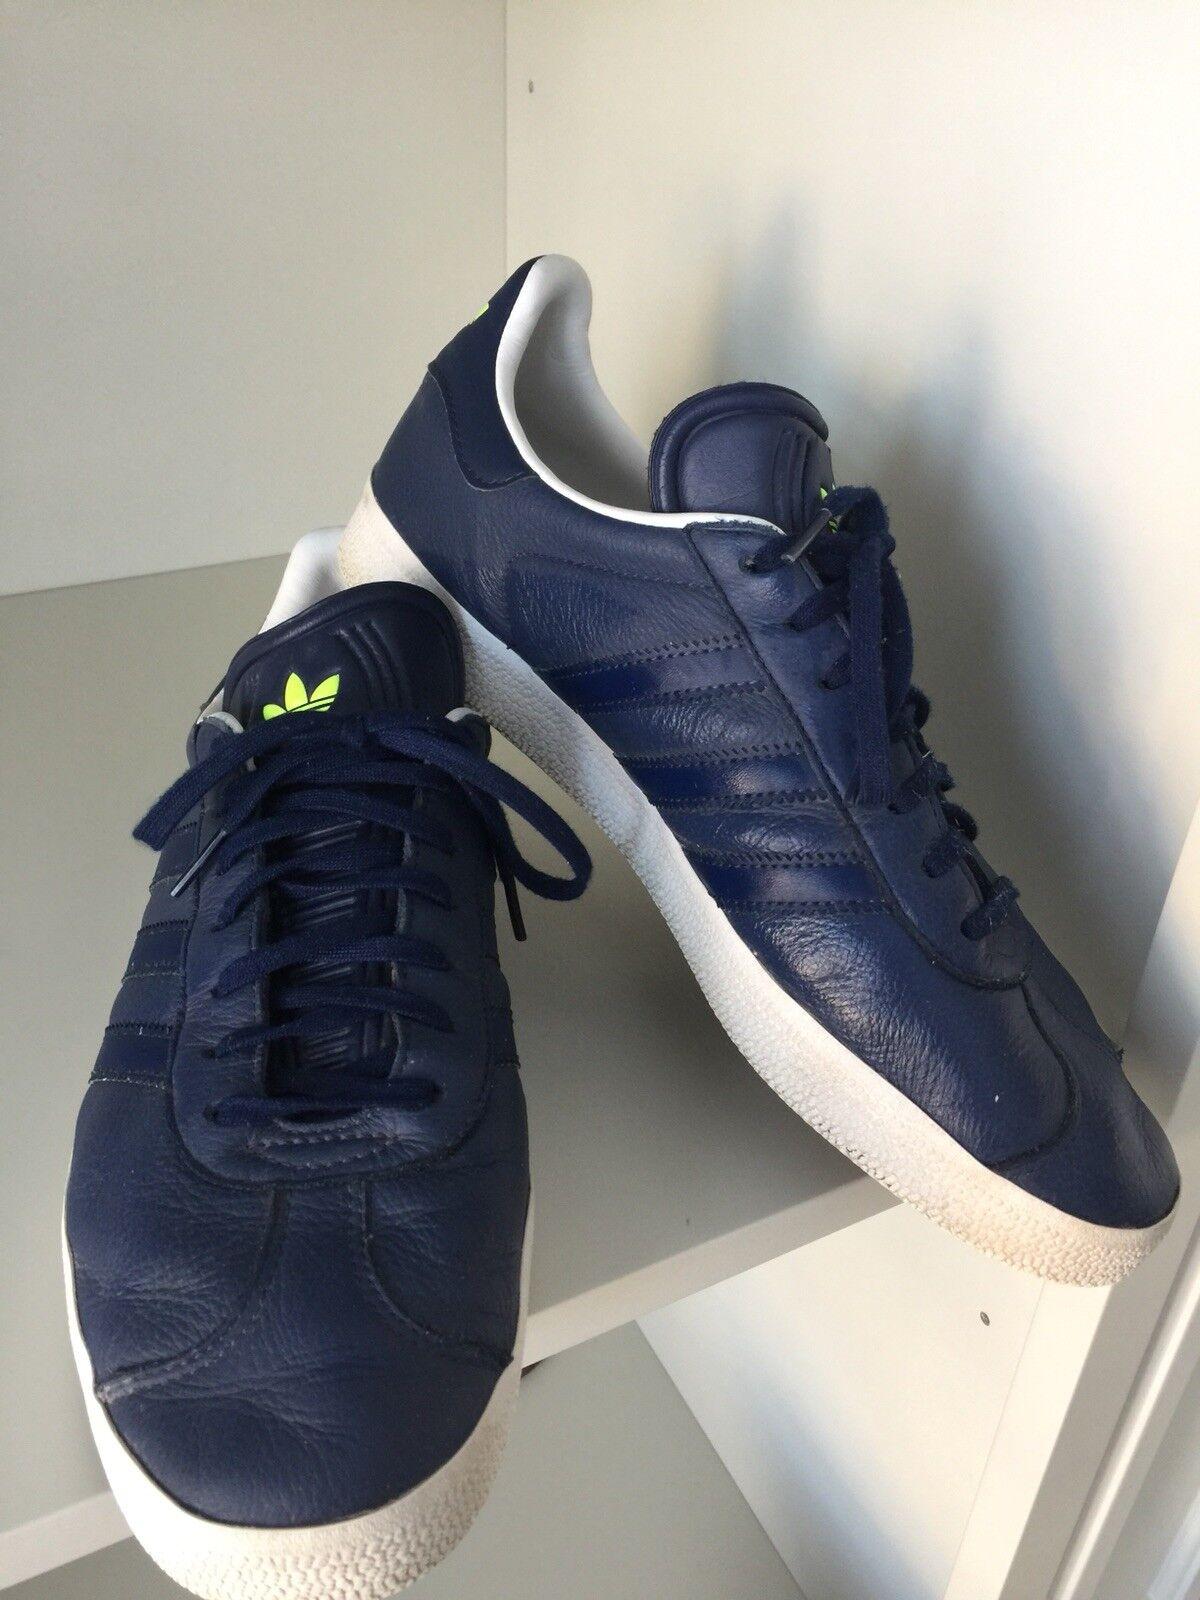 ADIDAS Originals Gazelle bluee Leather Men's Running shoes Size USA 10